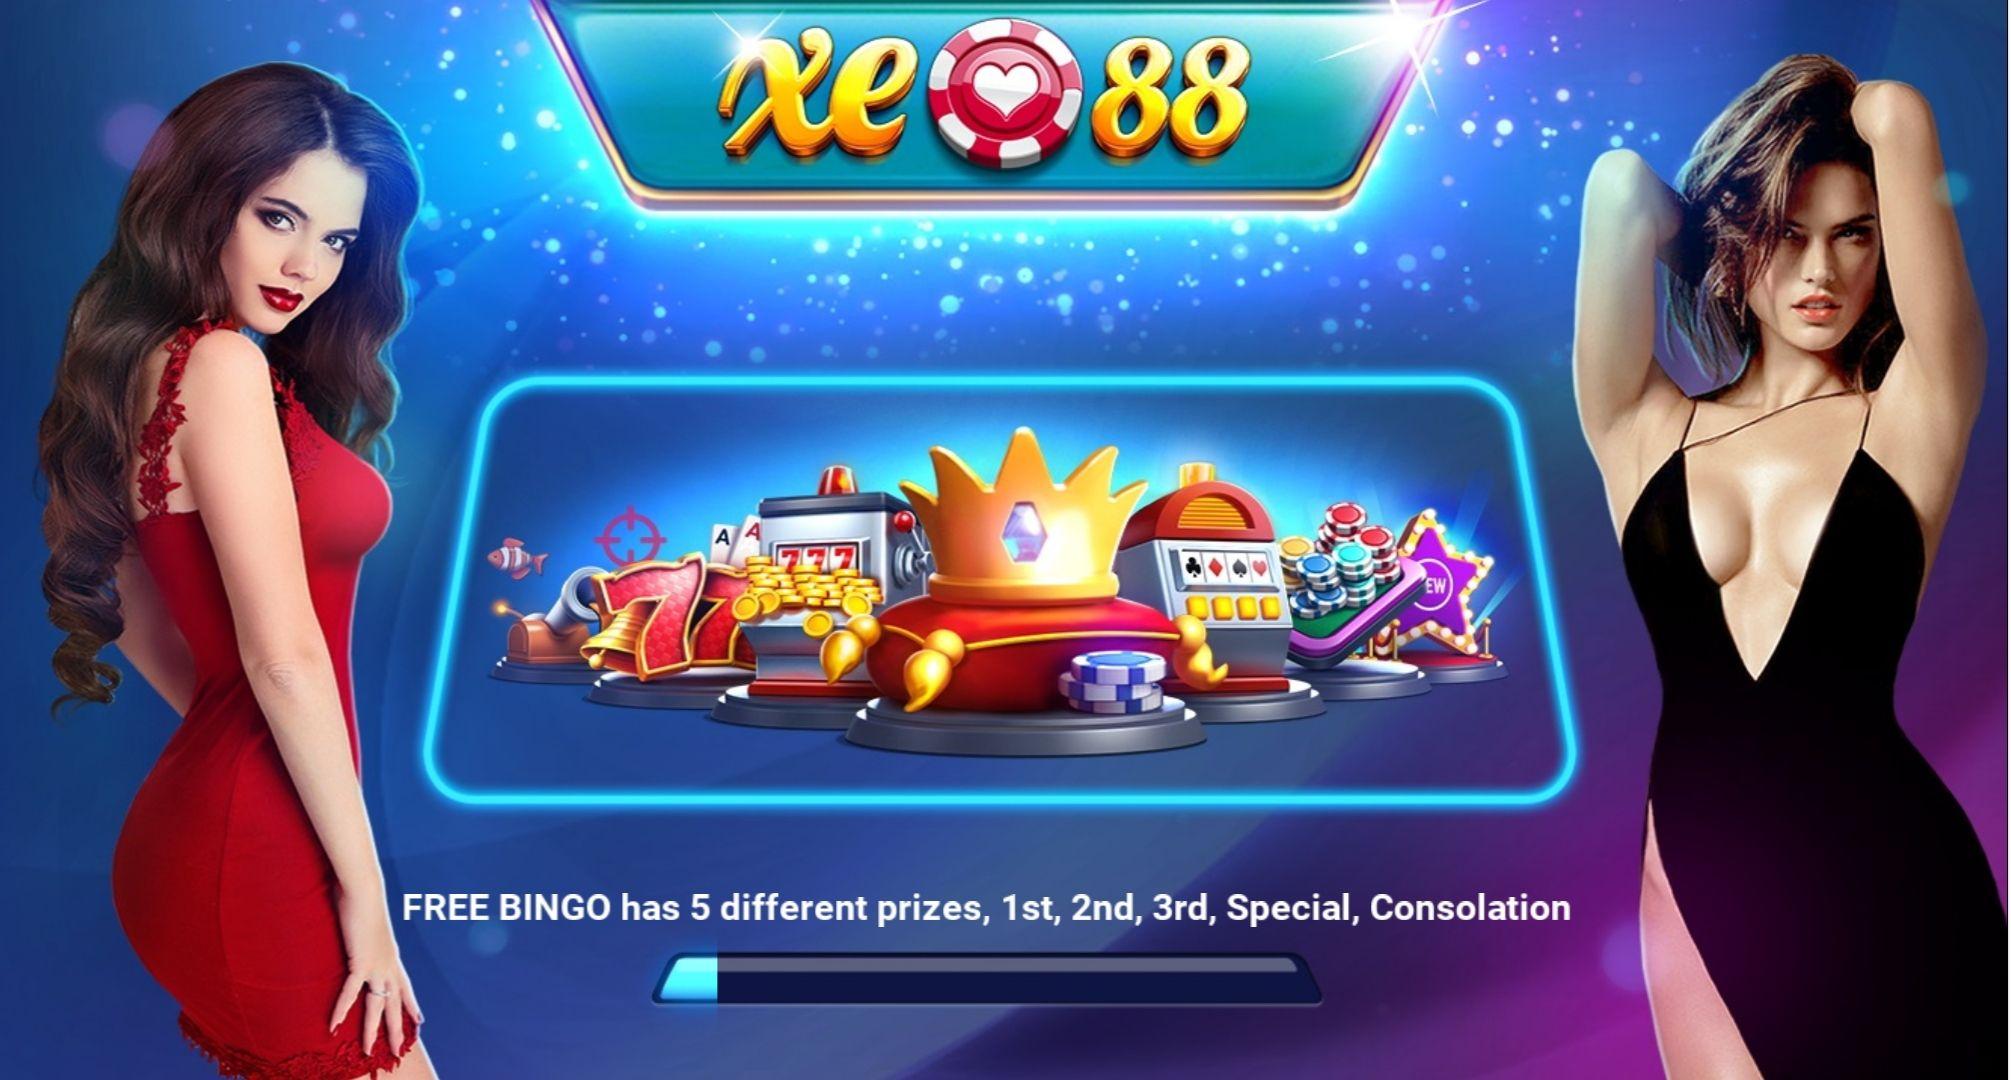 Jomkiss Online Casino Trusted 918kiss Company Malaysia Online Casino Slots Free Casino Slot Games Play Online Casino